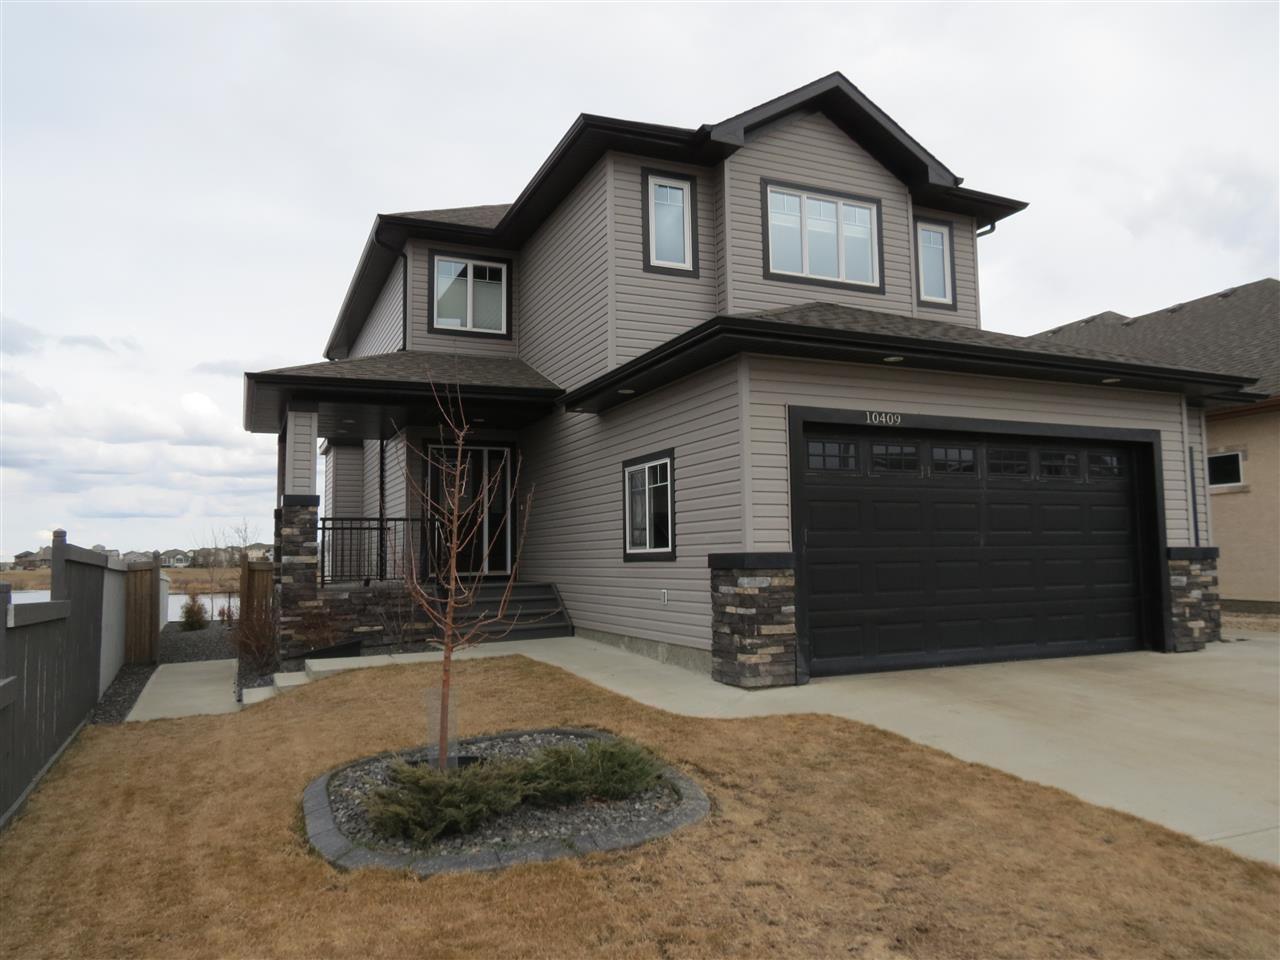 Main Photo: 10409 97 Street: Morinville House for sale : MLS®# E4147779